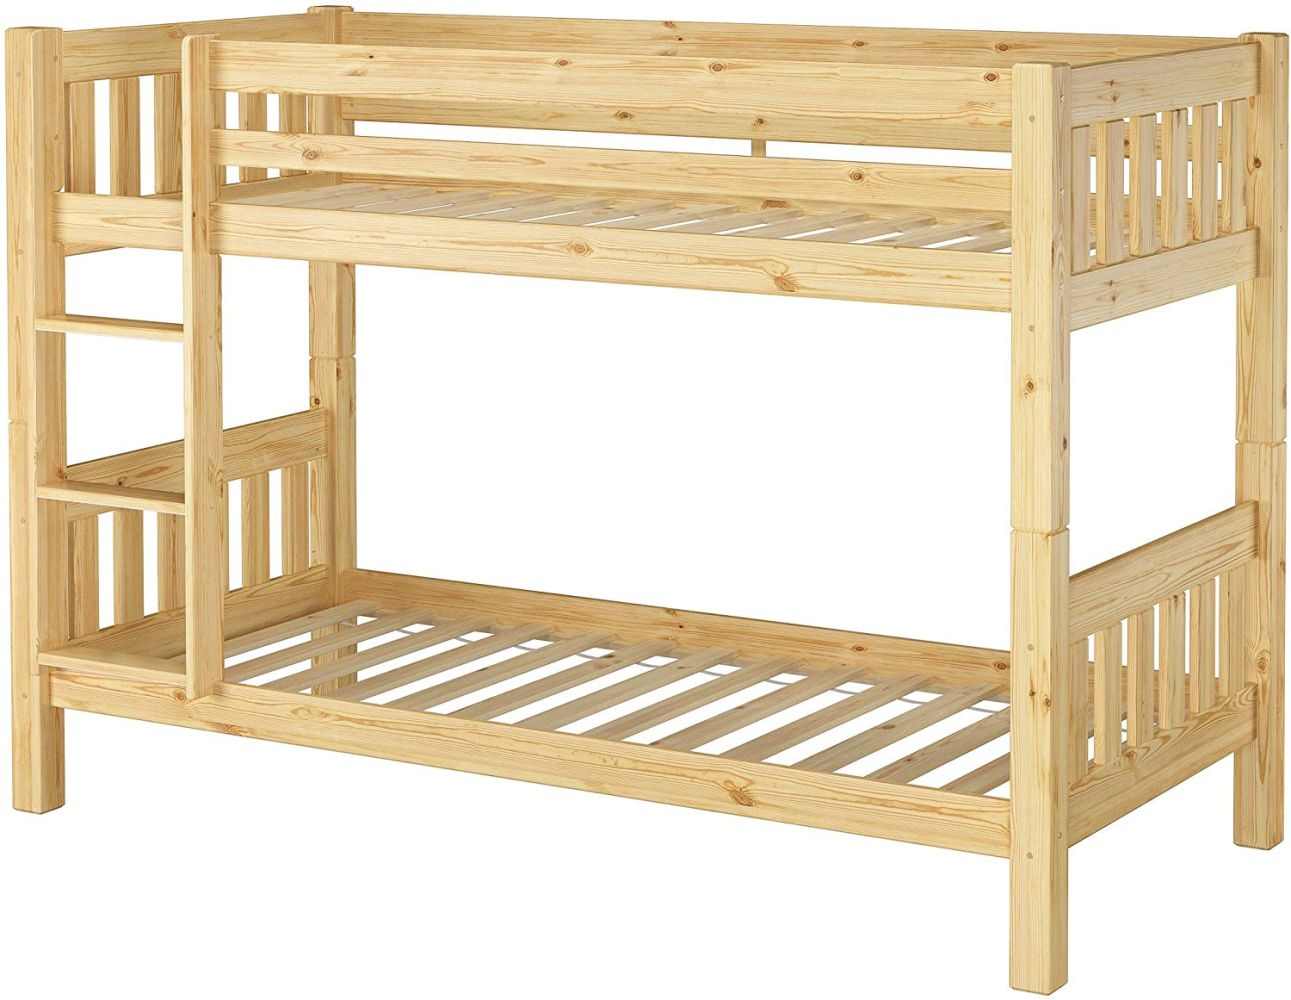 Erst-Holz Etagenbett Kiefer 90x200 cm, natur Bild 1